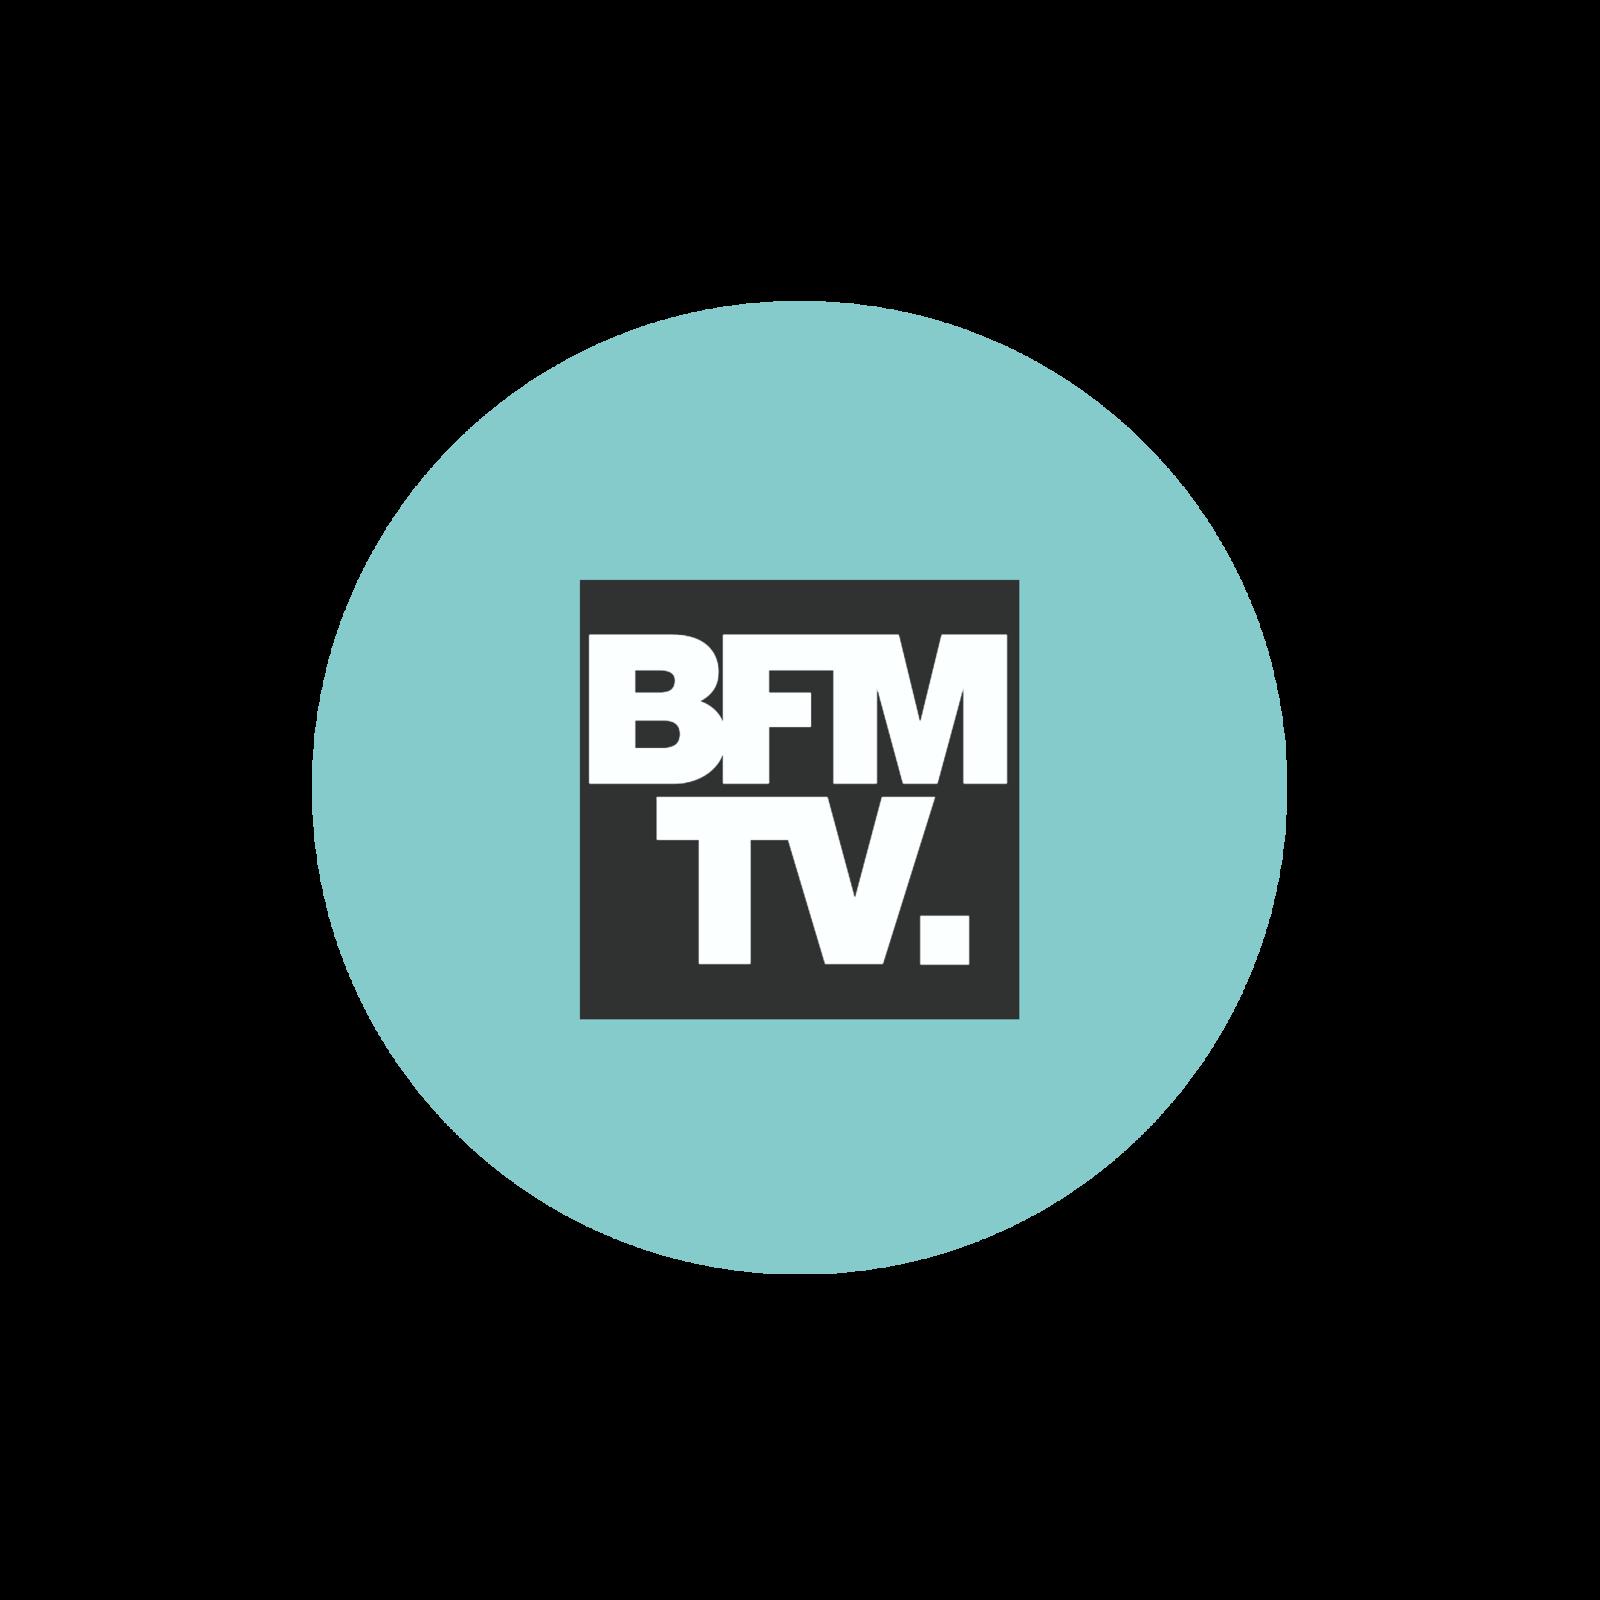 La chaîne BFMTV adapte ses programmes dès ce mercredi.